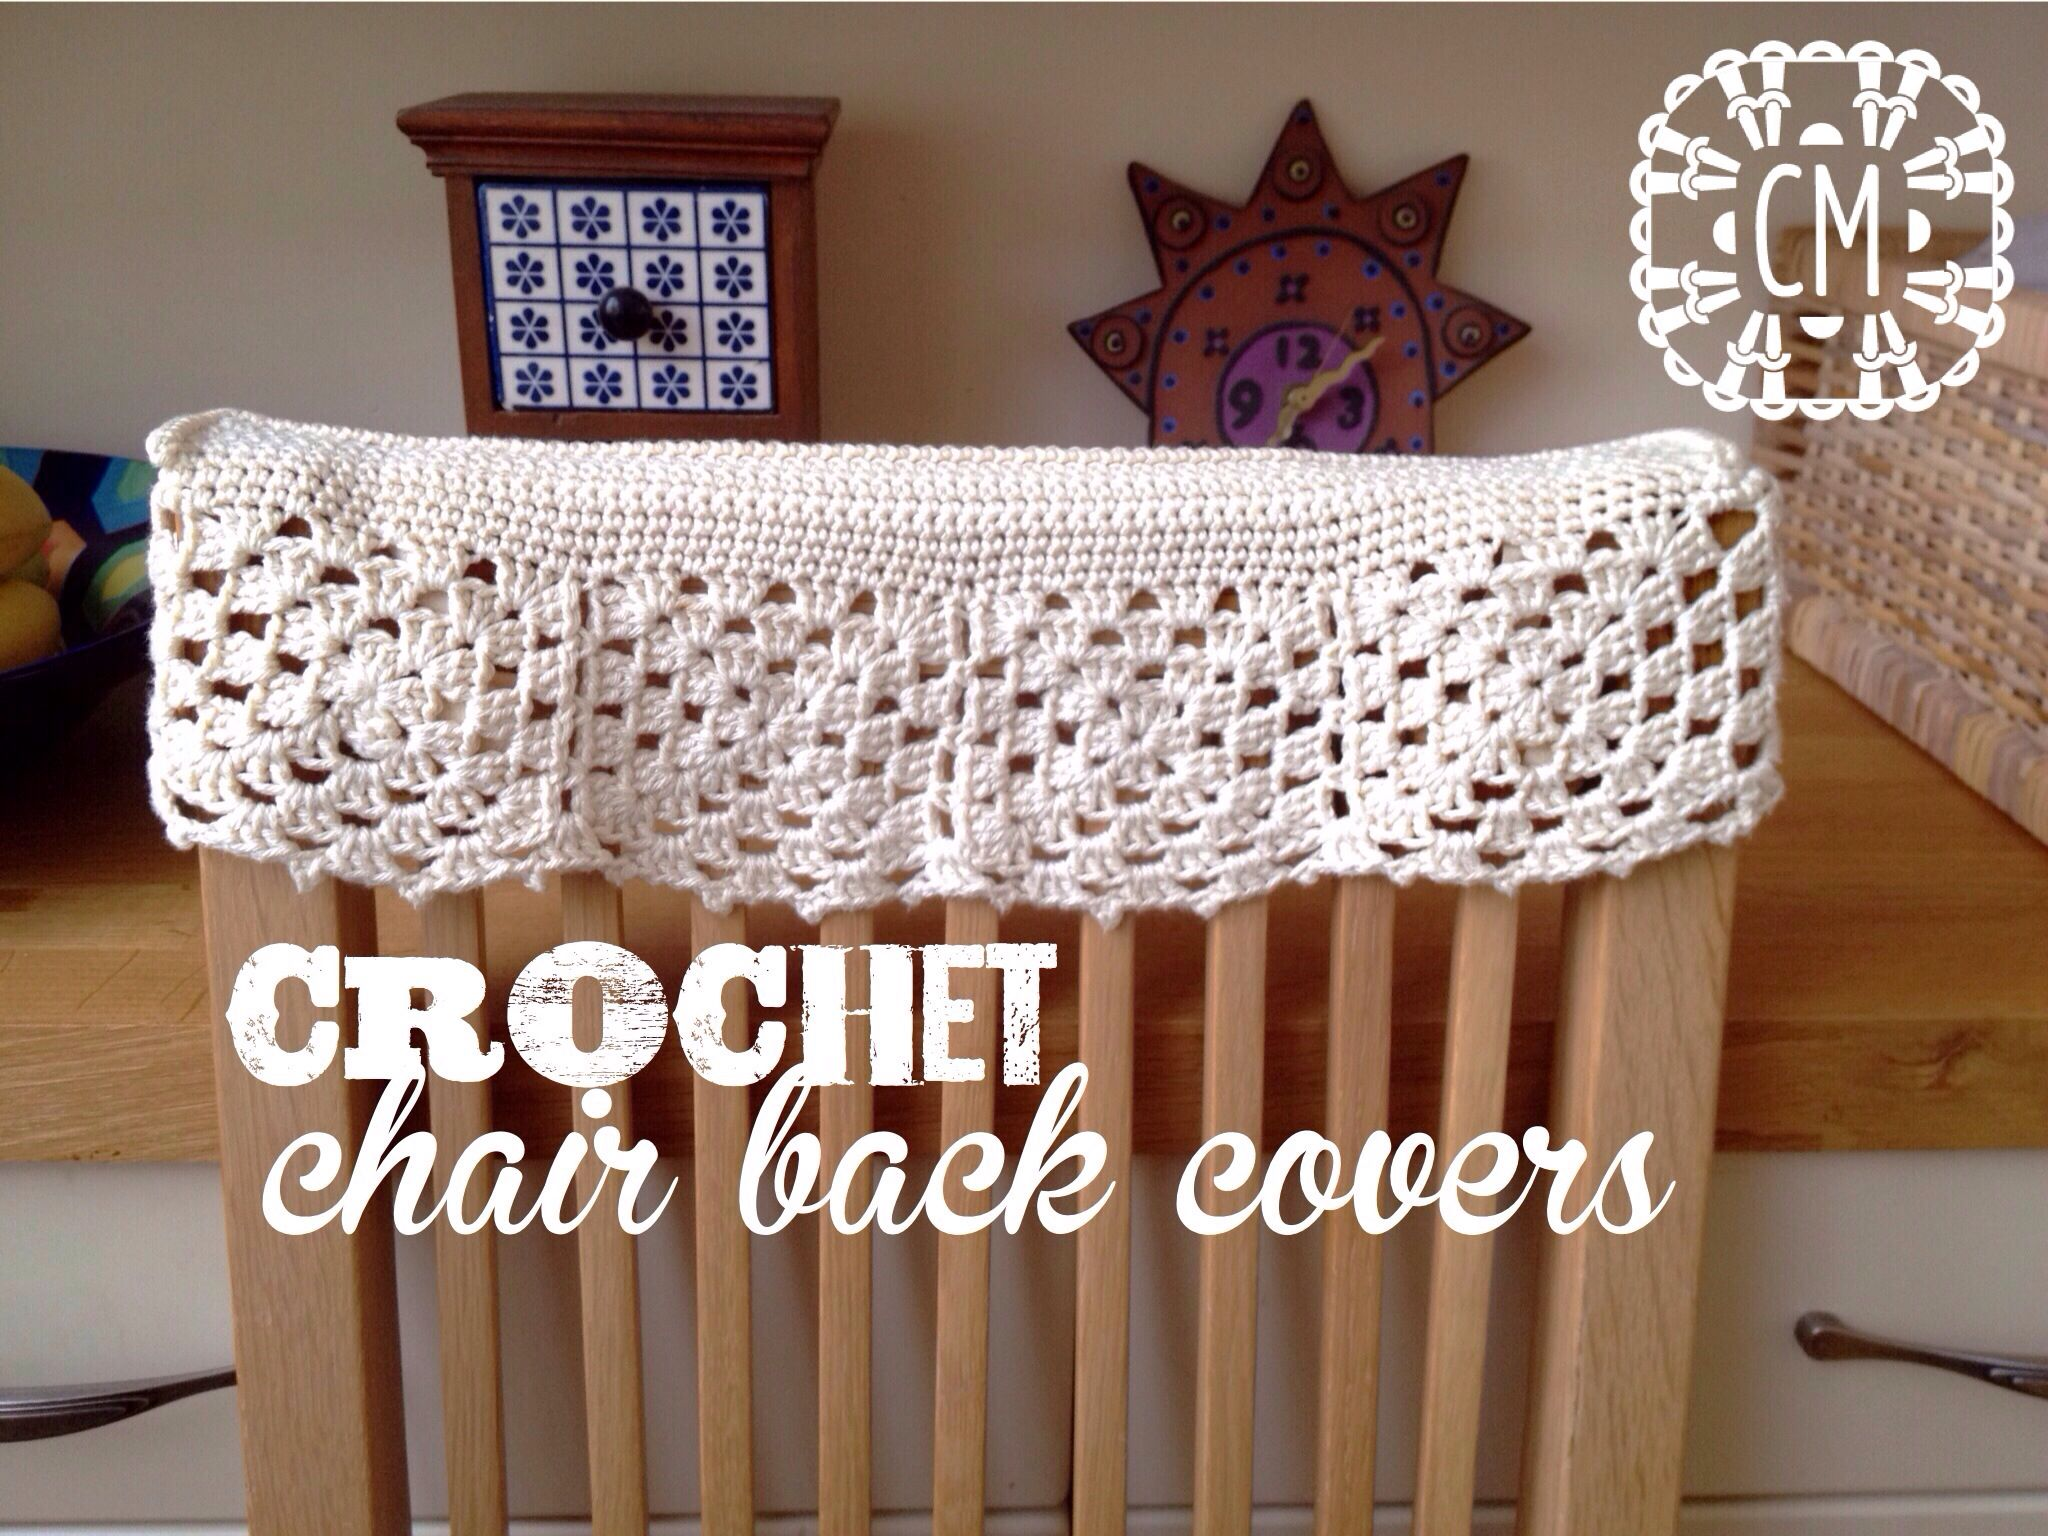 Crochet Chair Back Covers By Cara Medus - Free Crochet Diagram ...